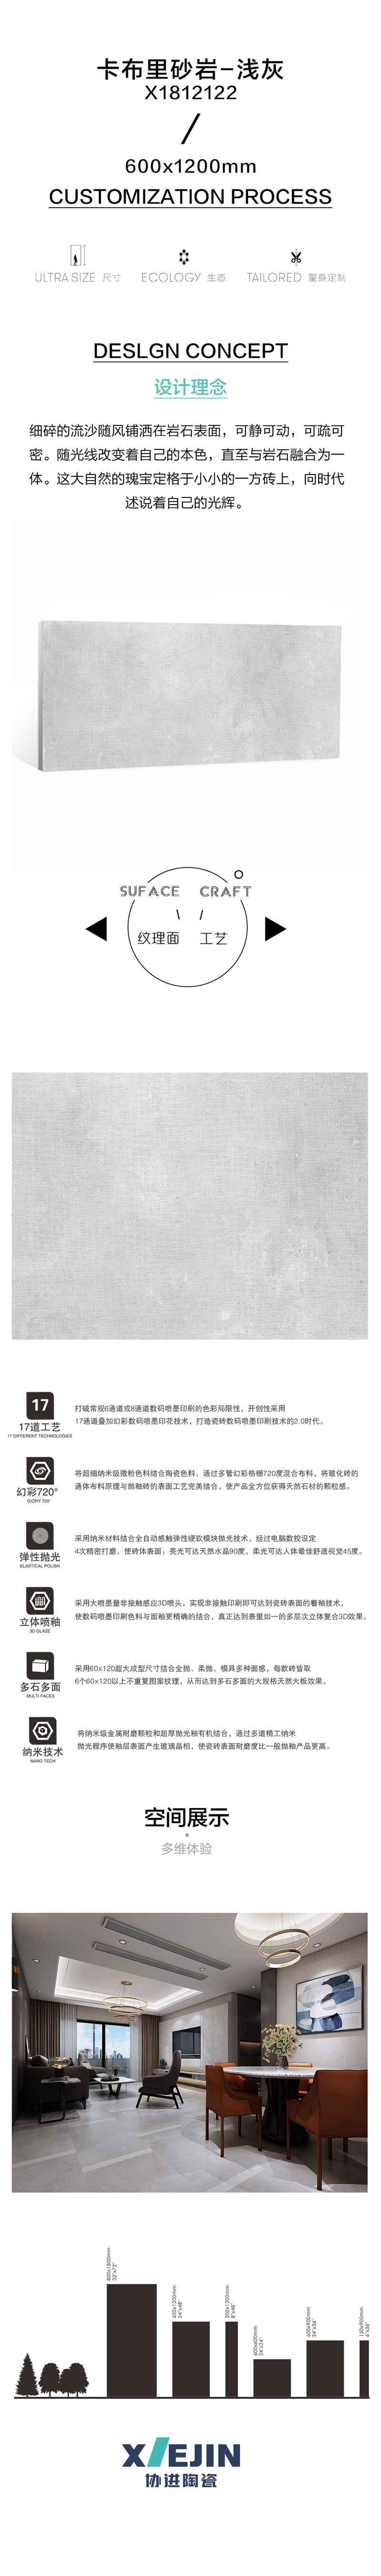 X1812122--09.jpg